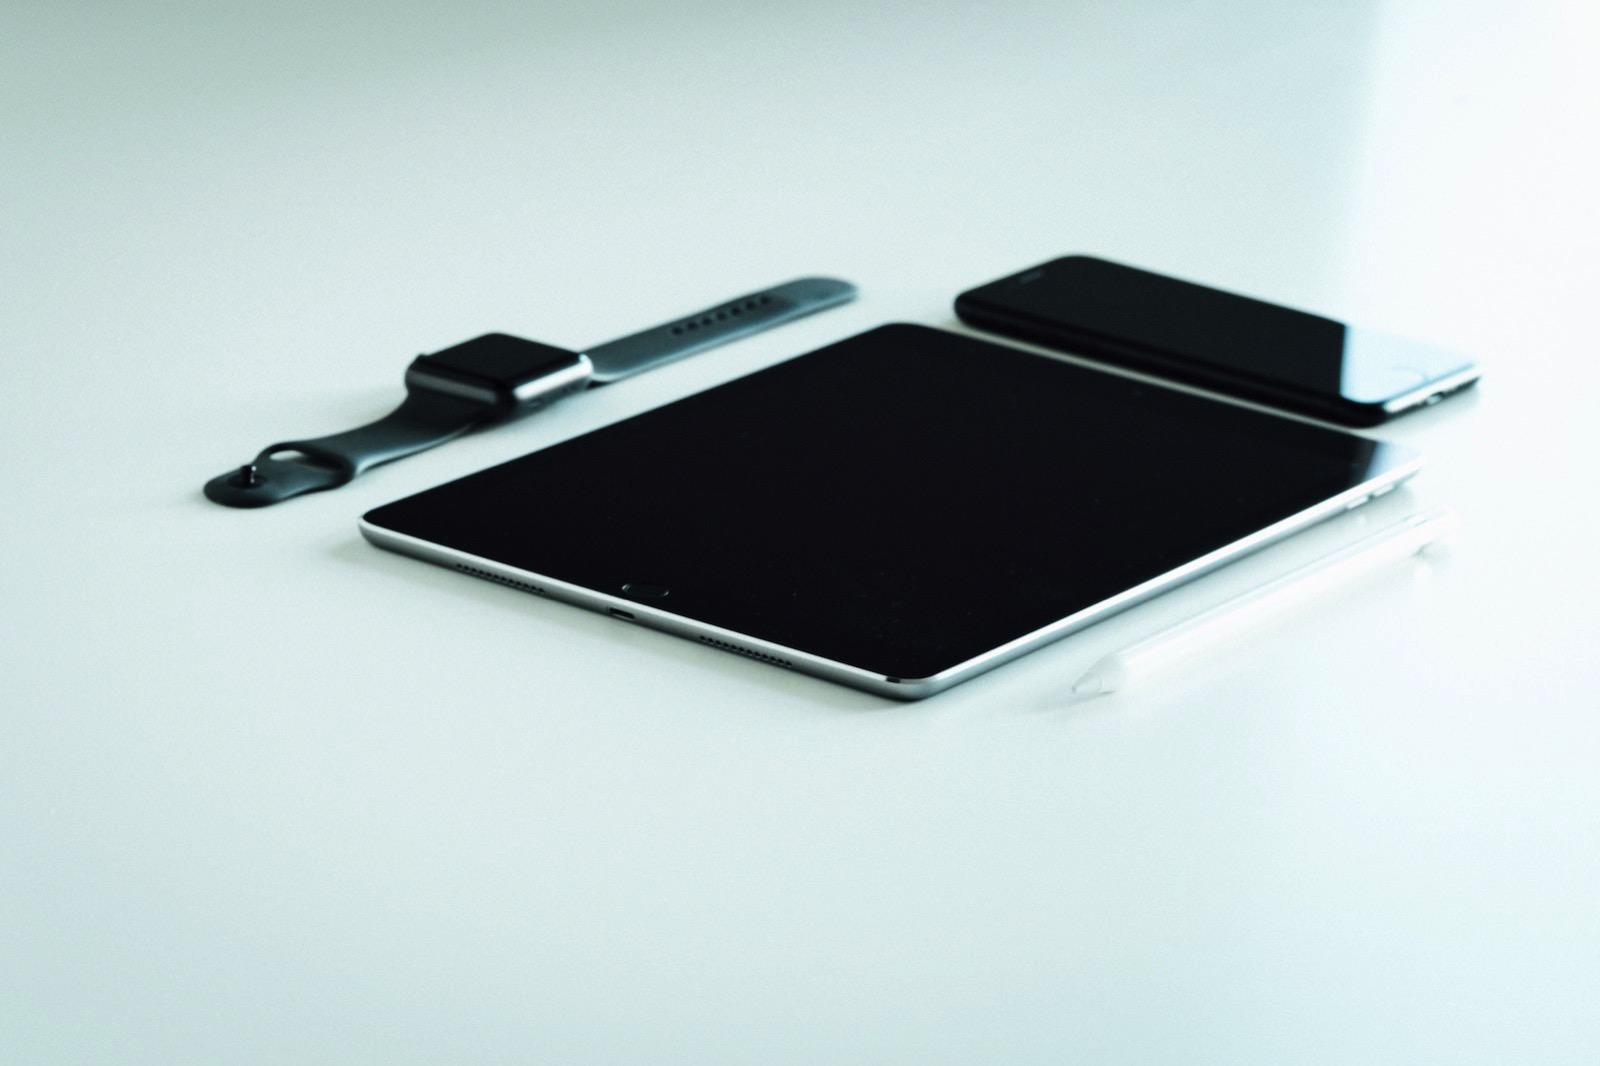 dose-media-VshMsstVAx4-unsplash-iphone-ipad-watch.jpg